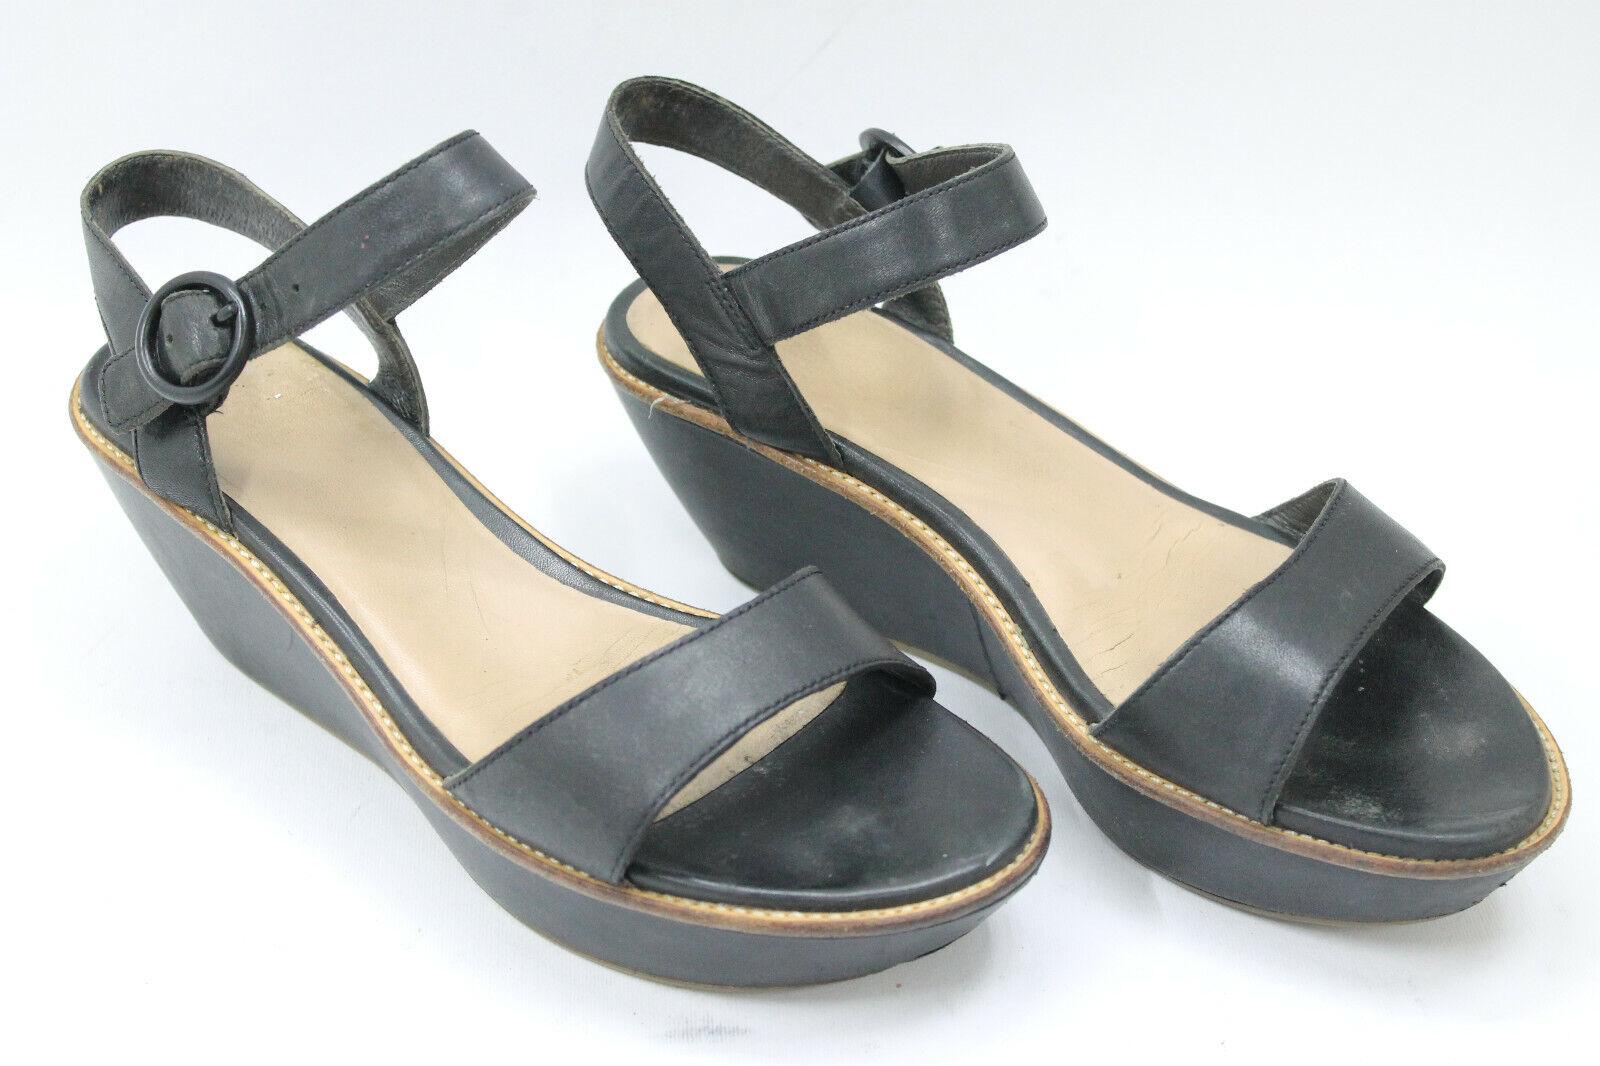 Camper Femmes Chaussures sz 8.5 EUROPE 39 en cuir noir S7646